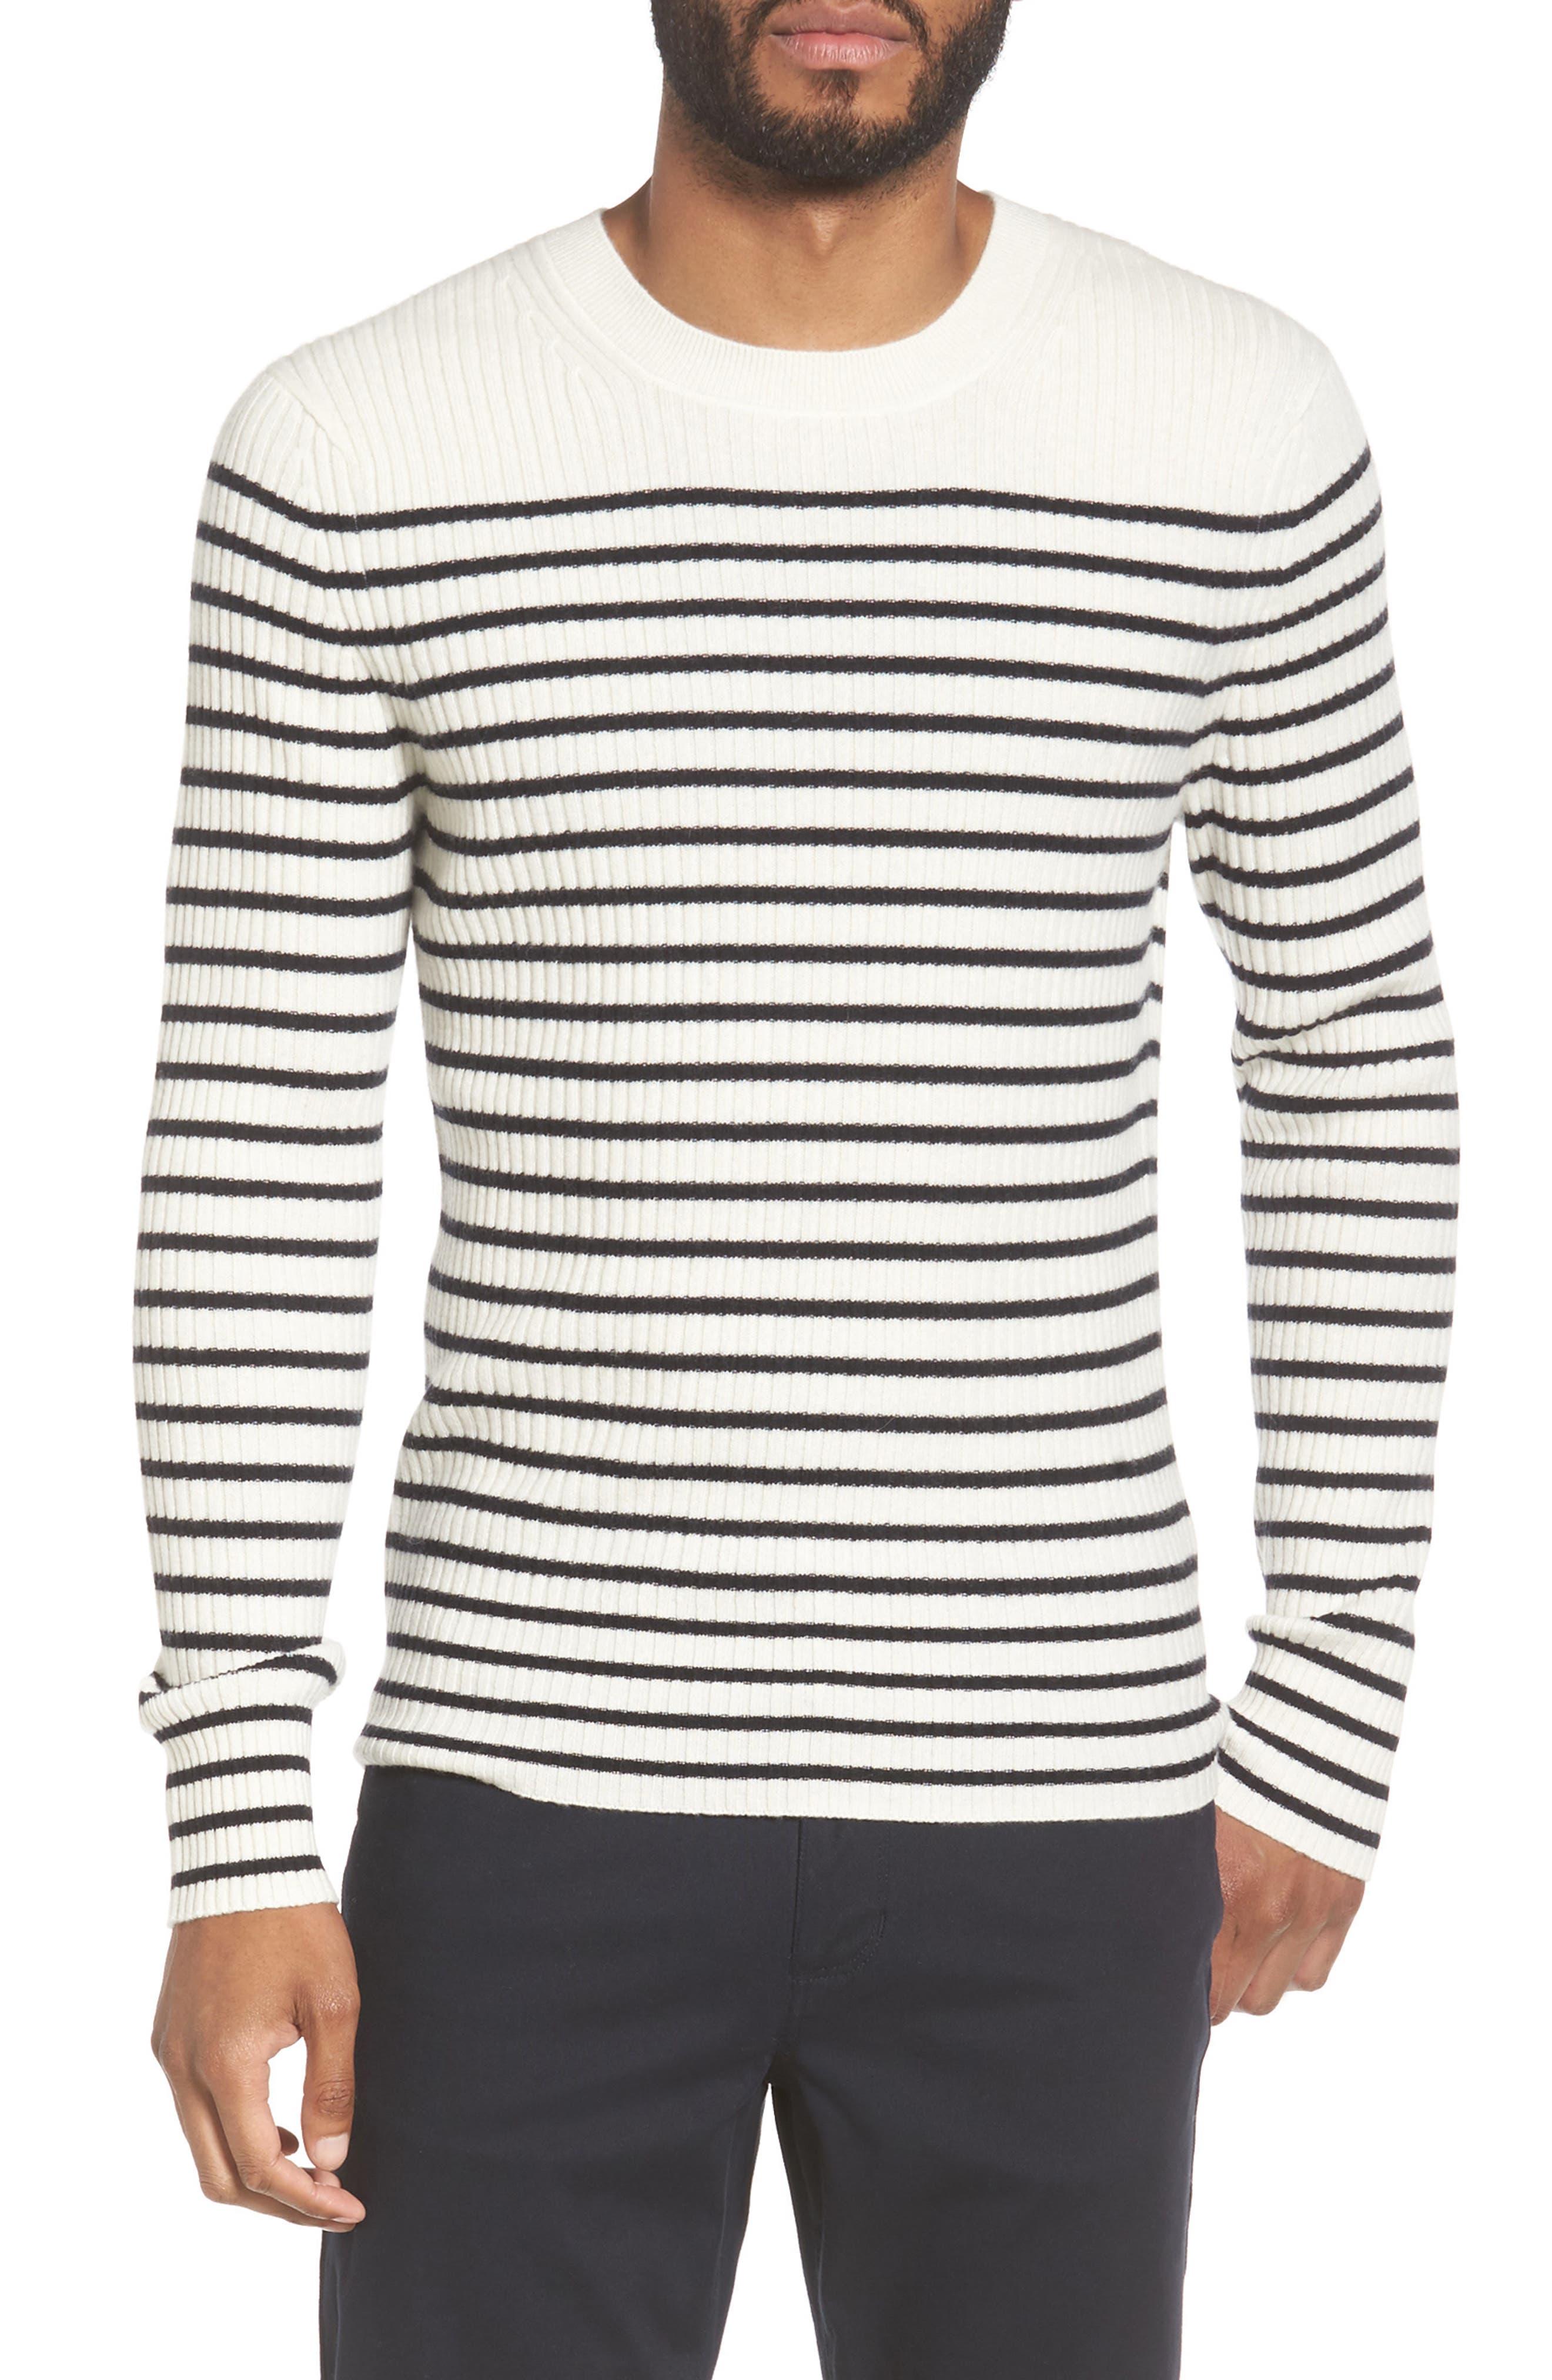 Vince Slim Fit Breton Stripe Cashmere Crewneck Sweater